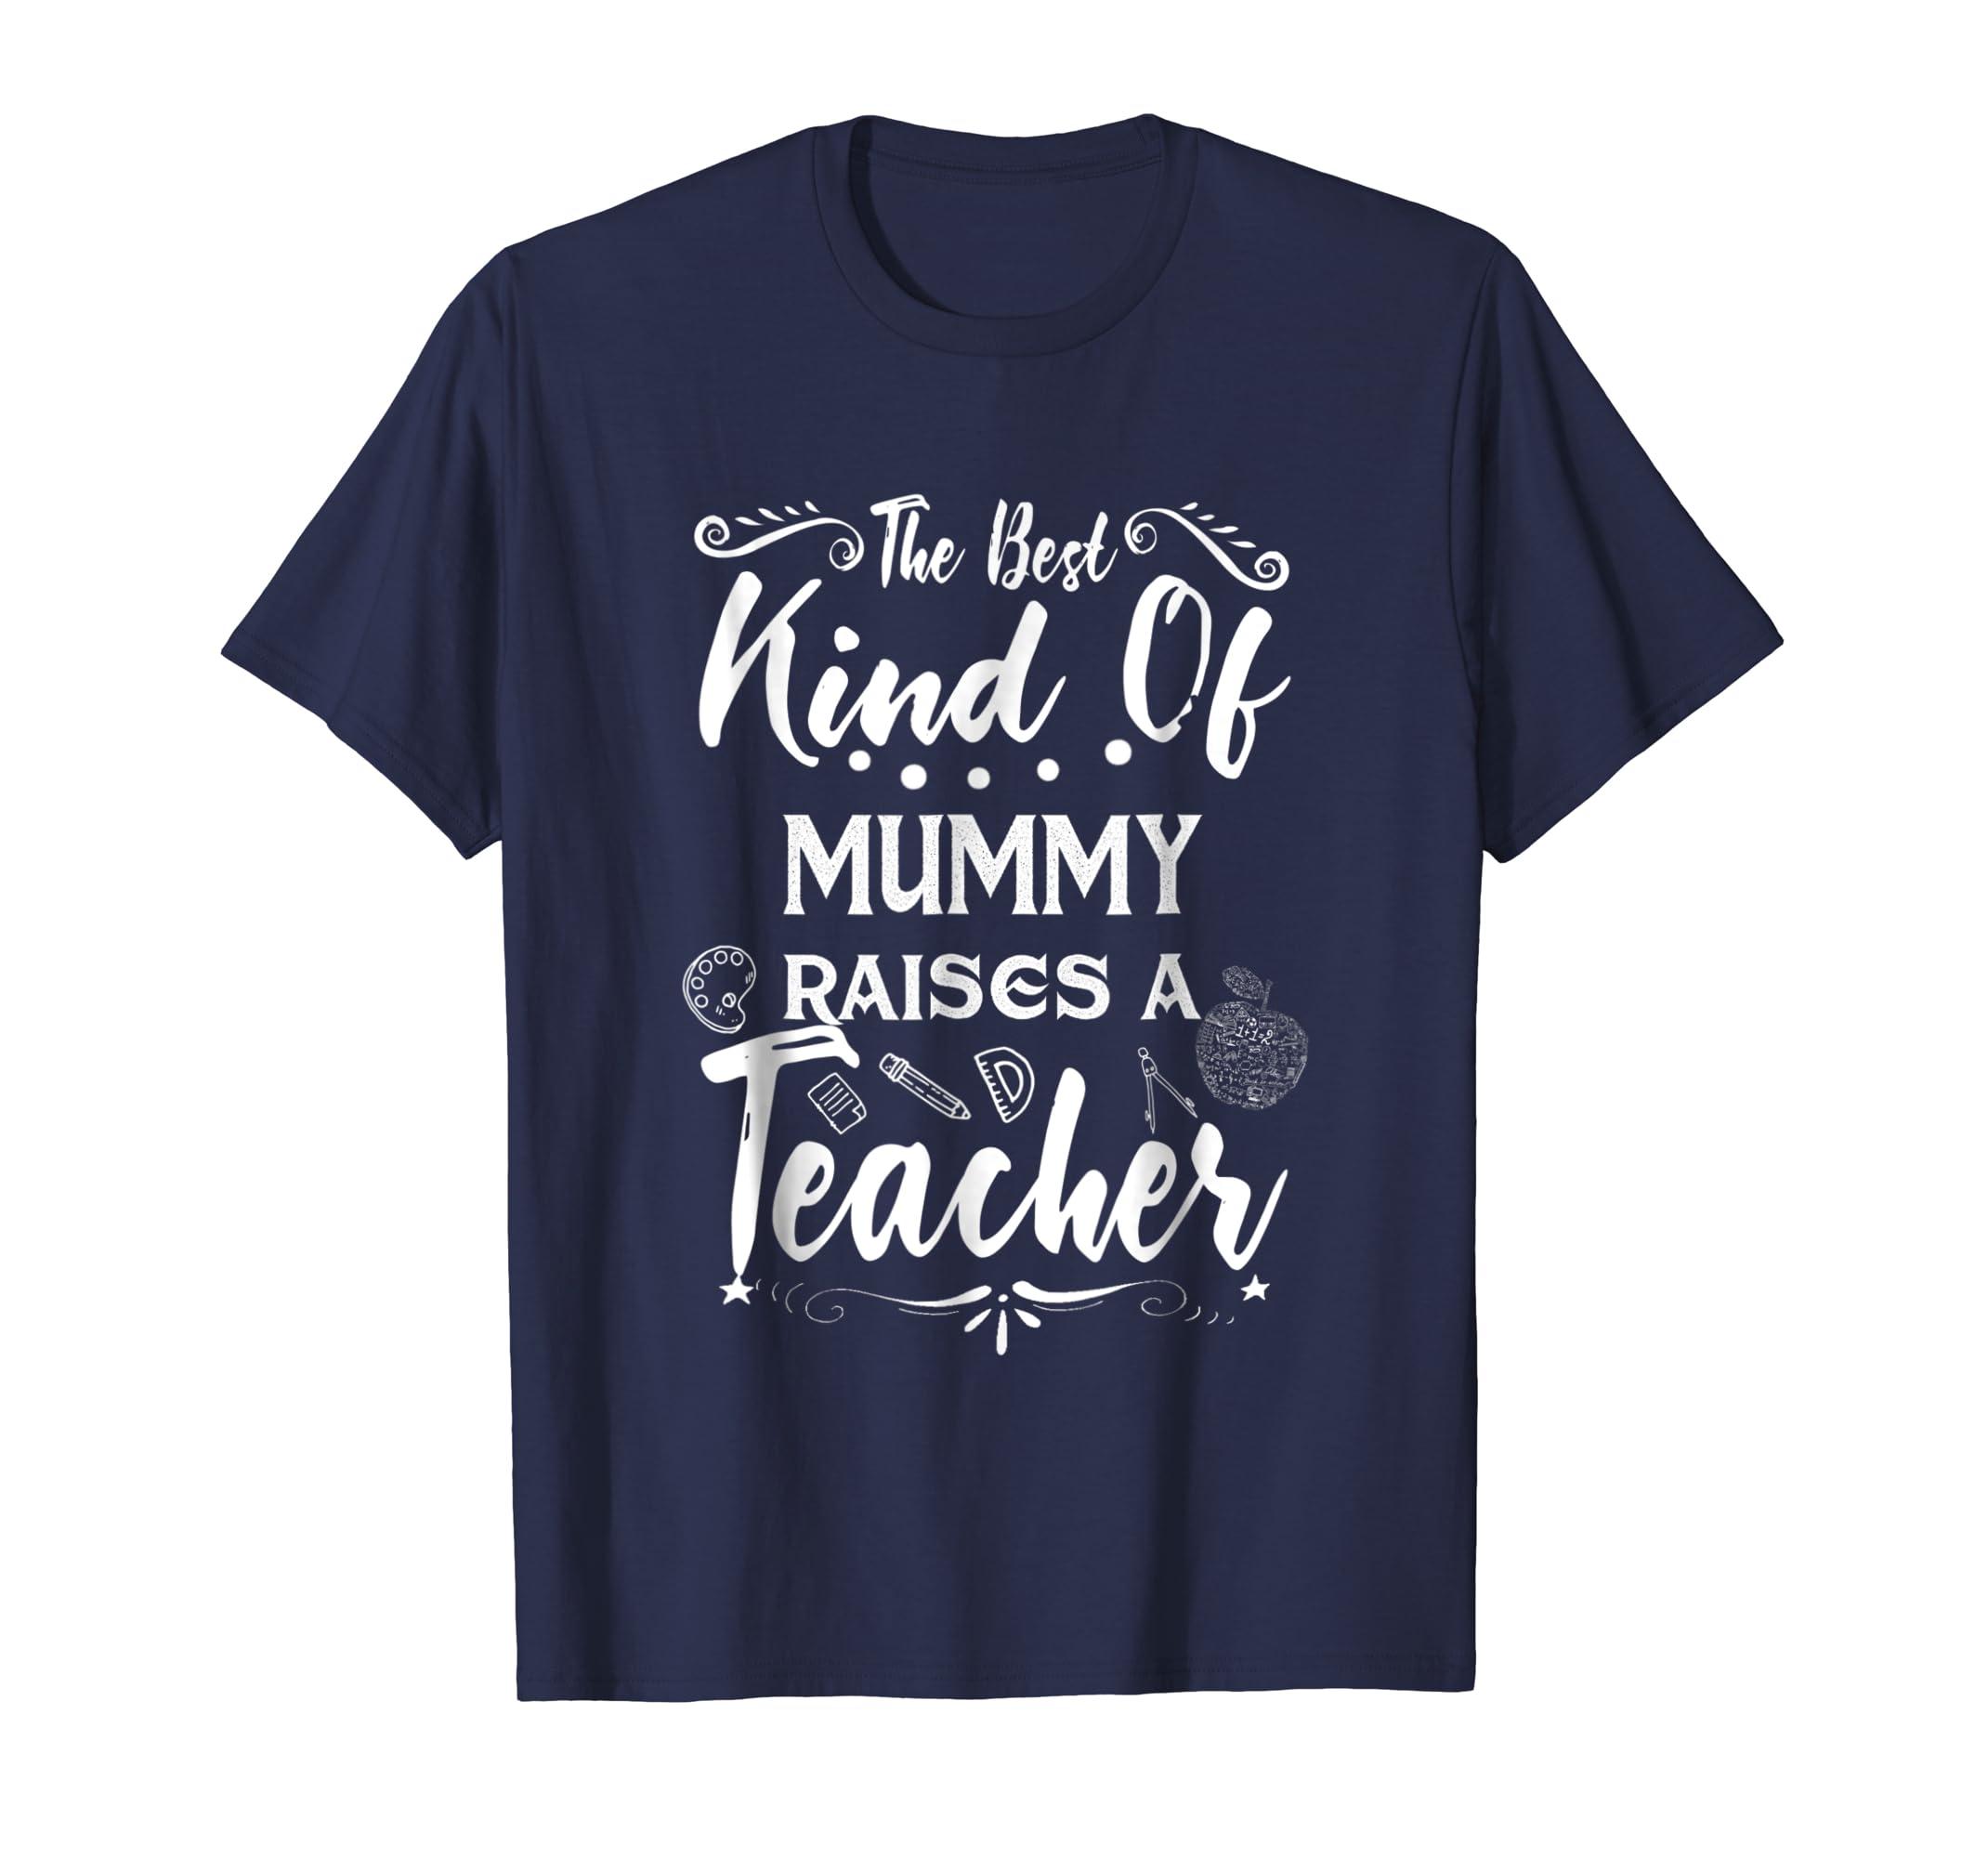 Best Kind of Mummy Raises Teacher Back To School Shirt-mt